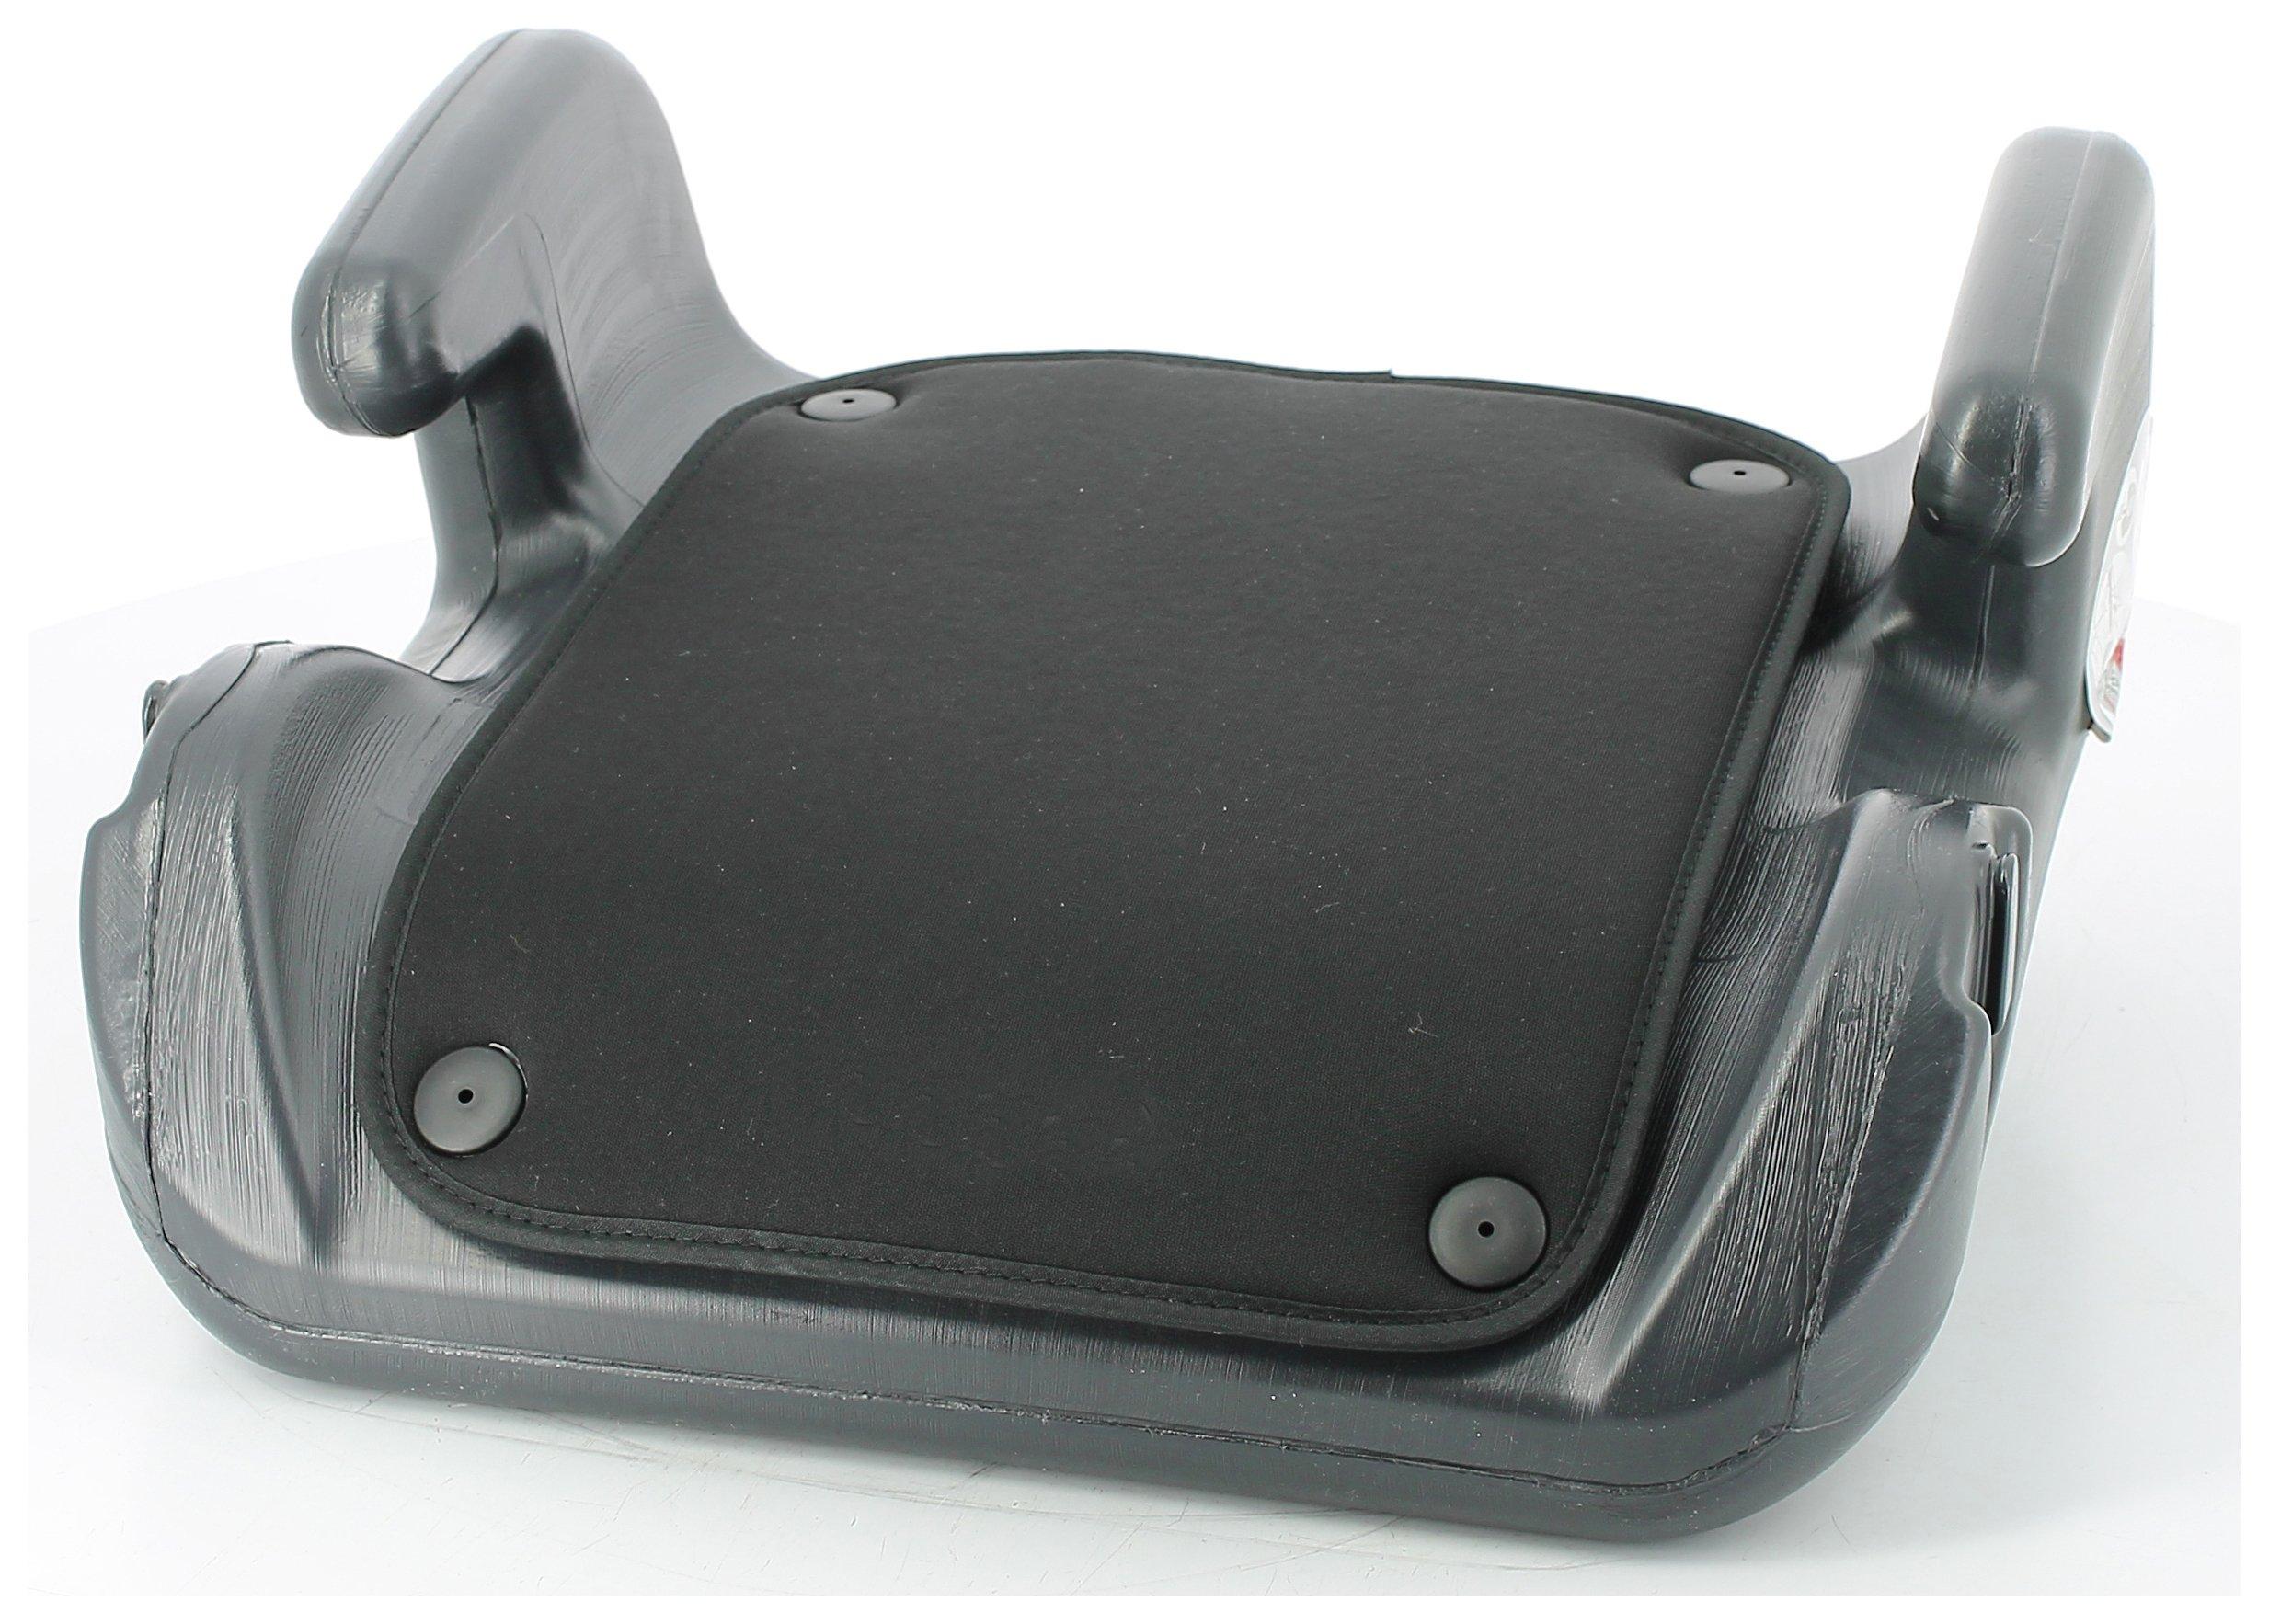 Cuggl Group 2/3 Plastic Car Booster Seat - Black